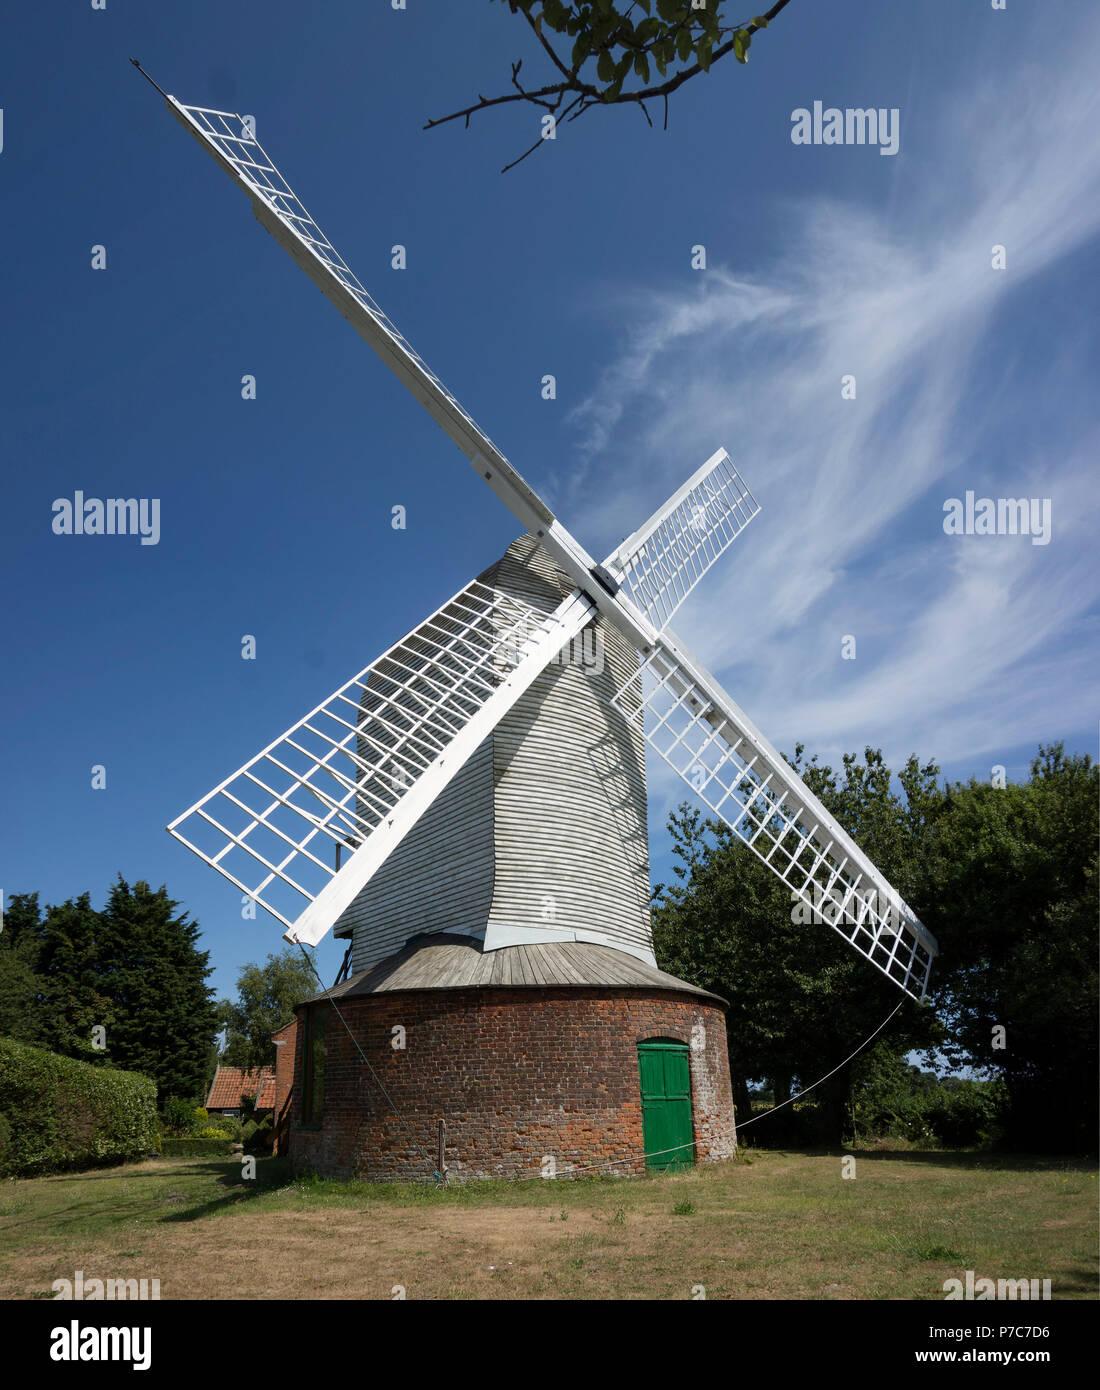 Thrigby Windmill